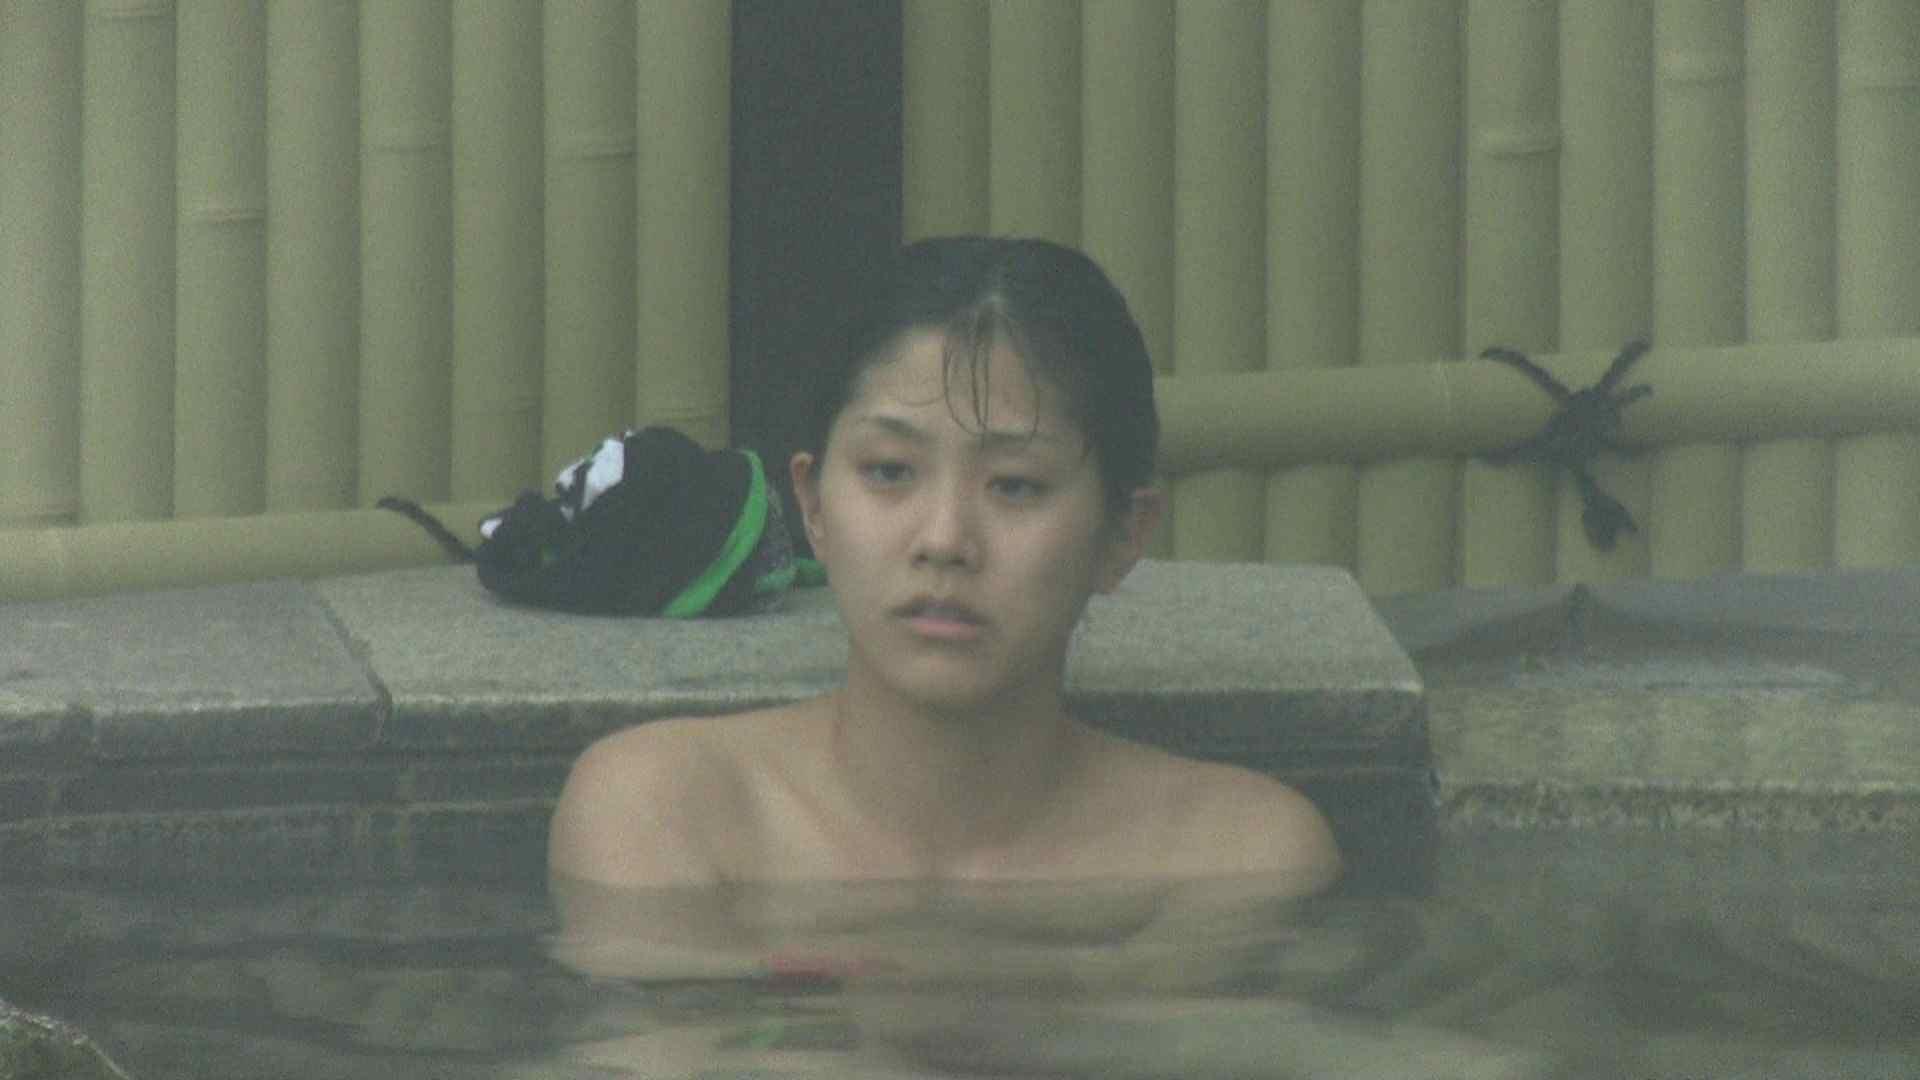 Aquaな露天風呂Vol.174 露天 盗撮画像 97連発 67